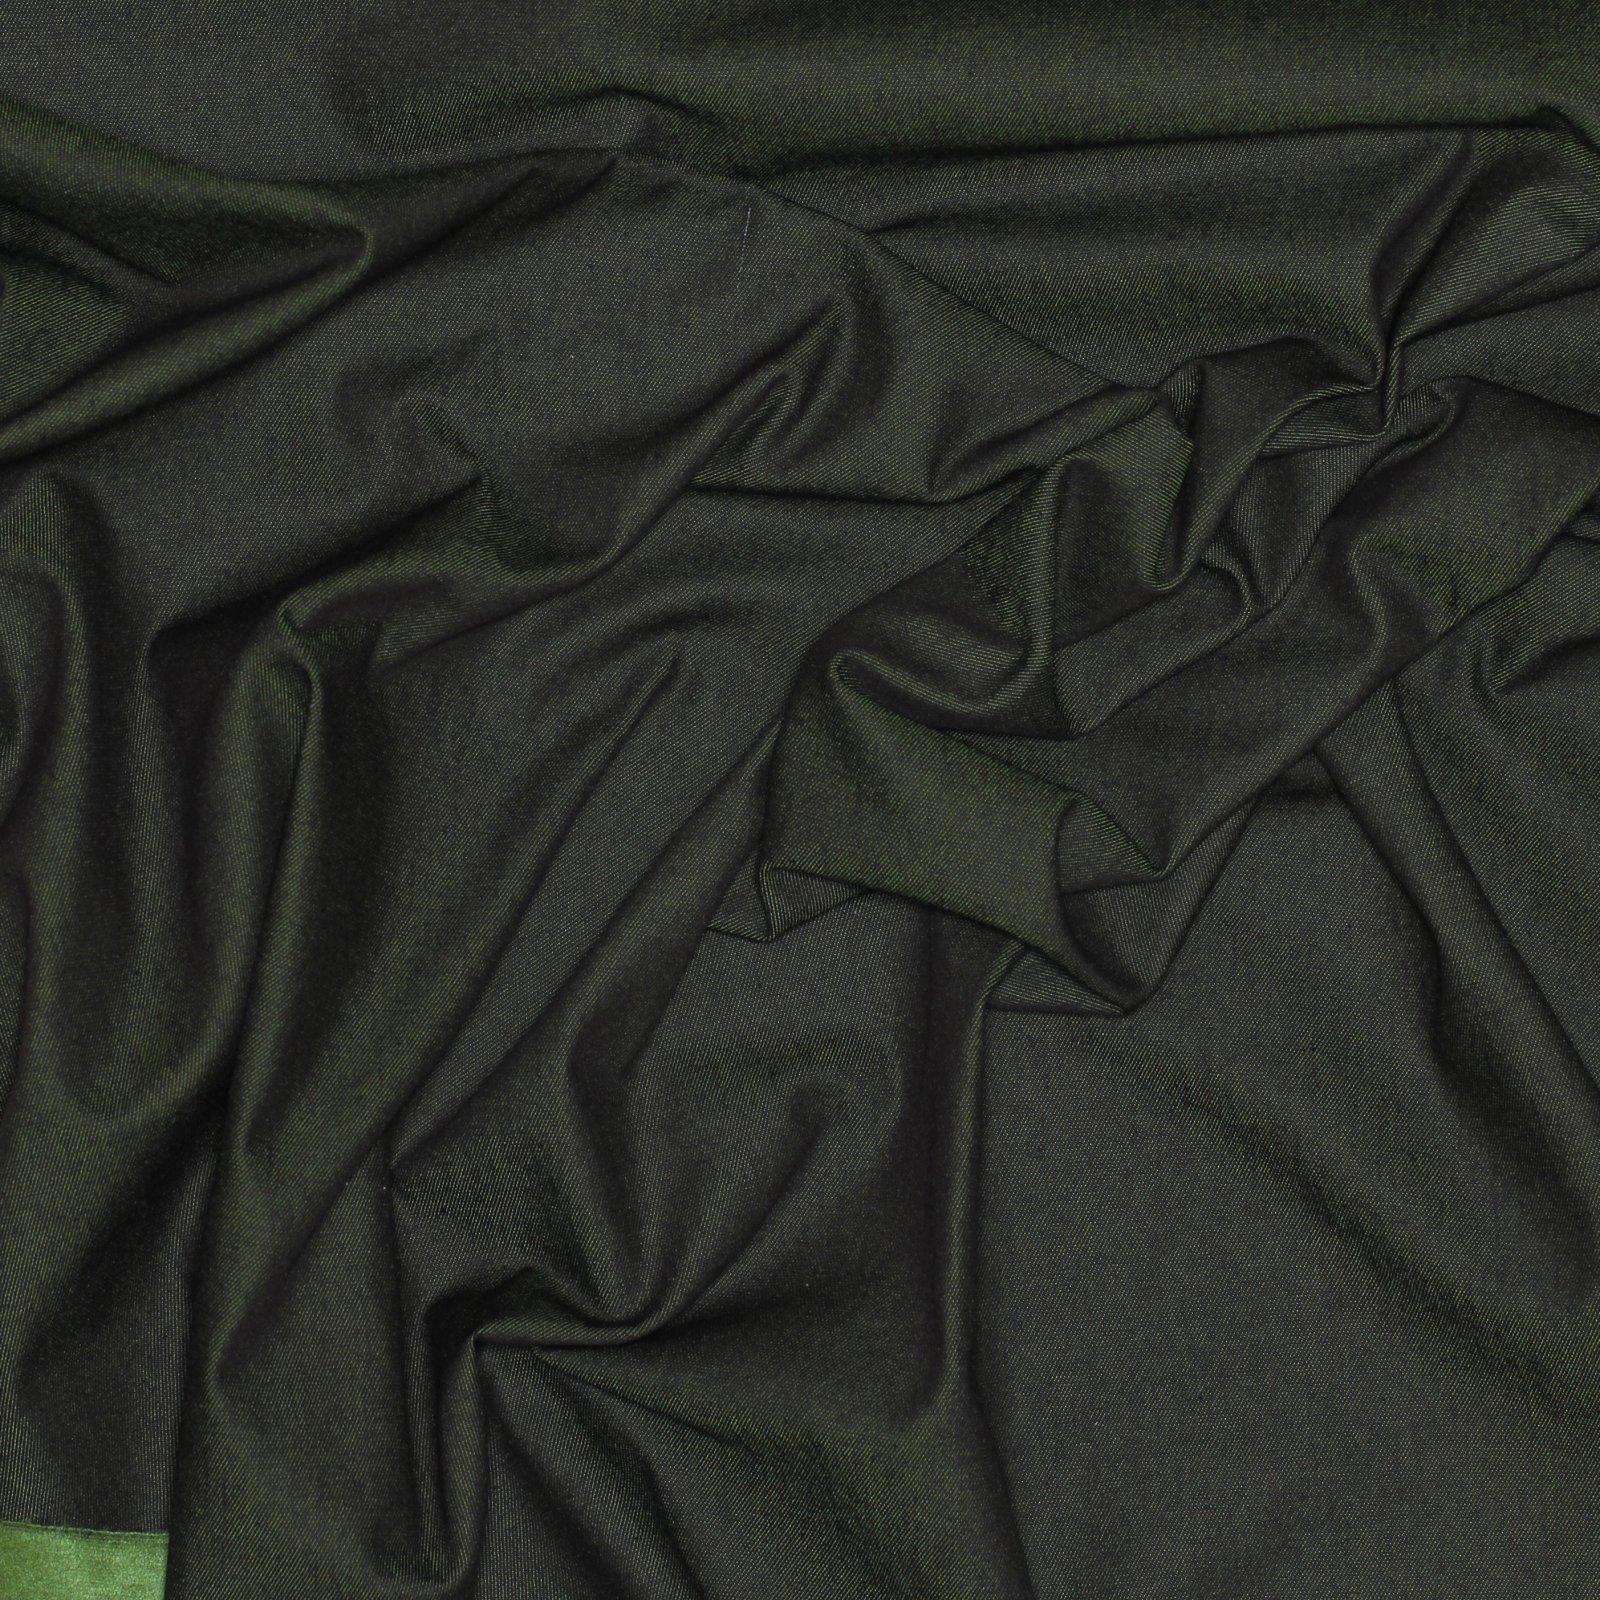 Lime Green/Brown Designer Denim